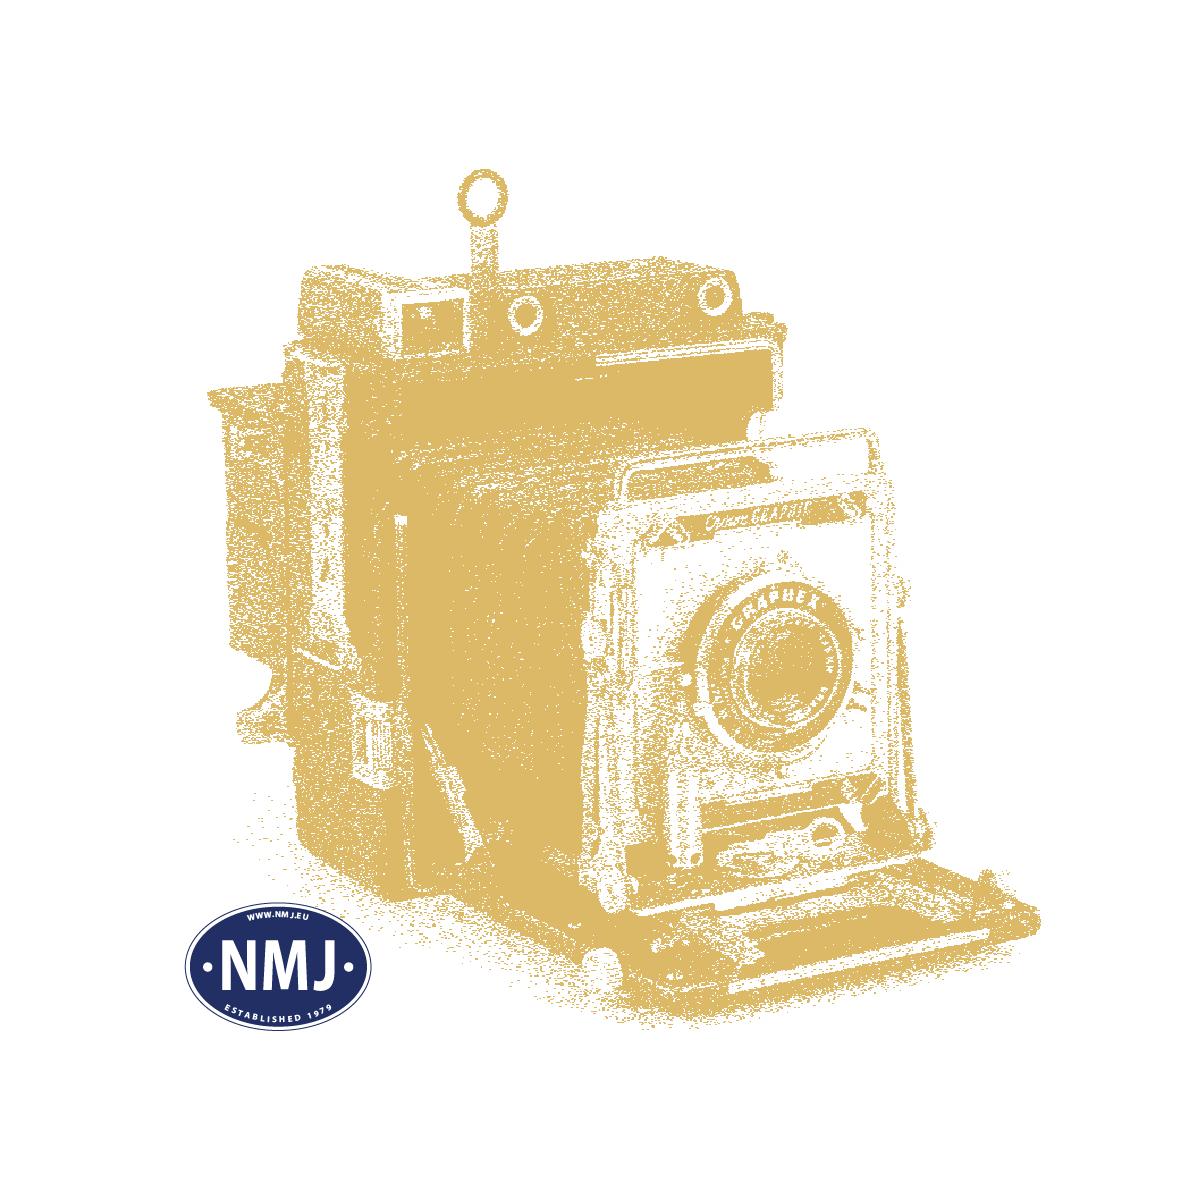 NMJT505.301 - NMJ Topline NSB Rps 31 76 393 3 013-1 w/ Finsam Wood Chip Boxes